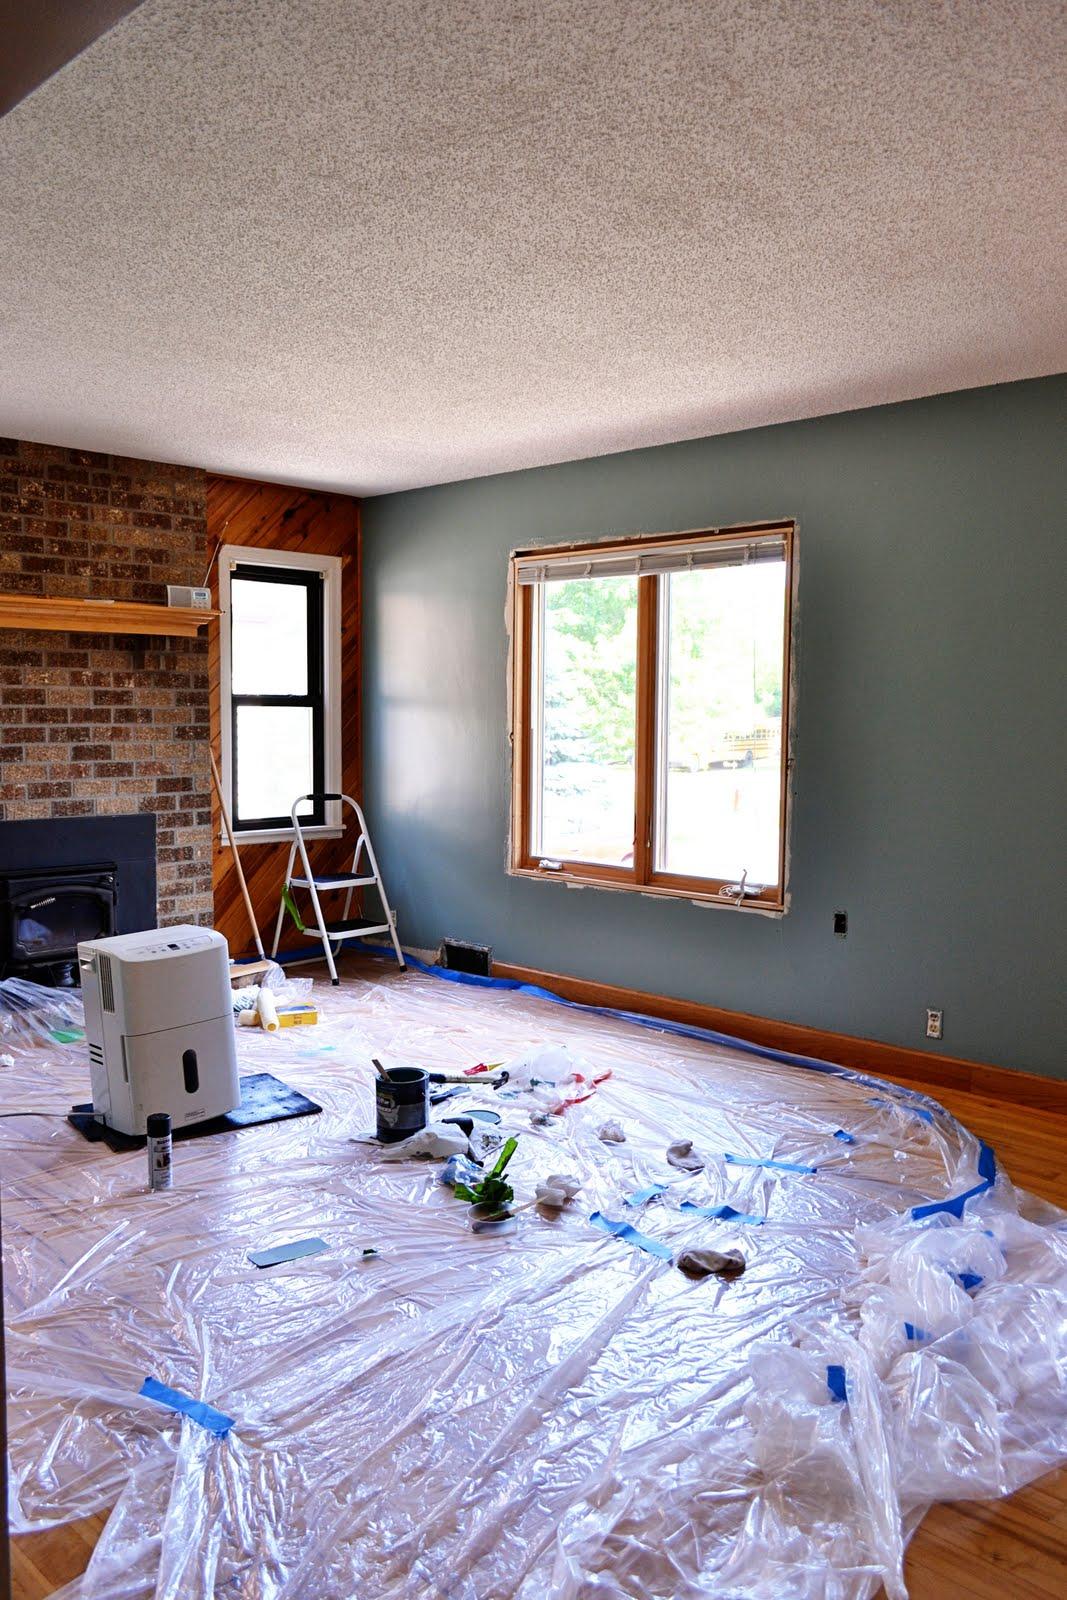 http://2.bp.blogspot.com/-MzVVHpXefGg/TmDQRceNihI/AAAAAAAAAqk/1YBsmn6W_O8/s1600/10+use+rollers+to+paintE.jpg